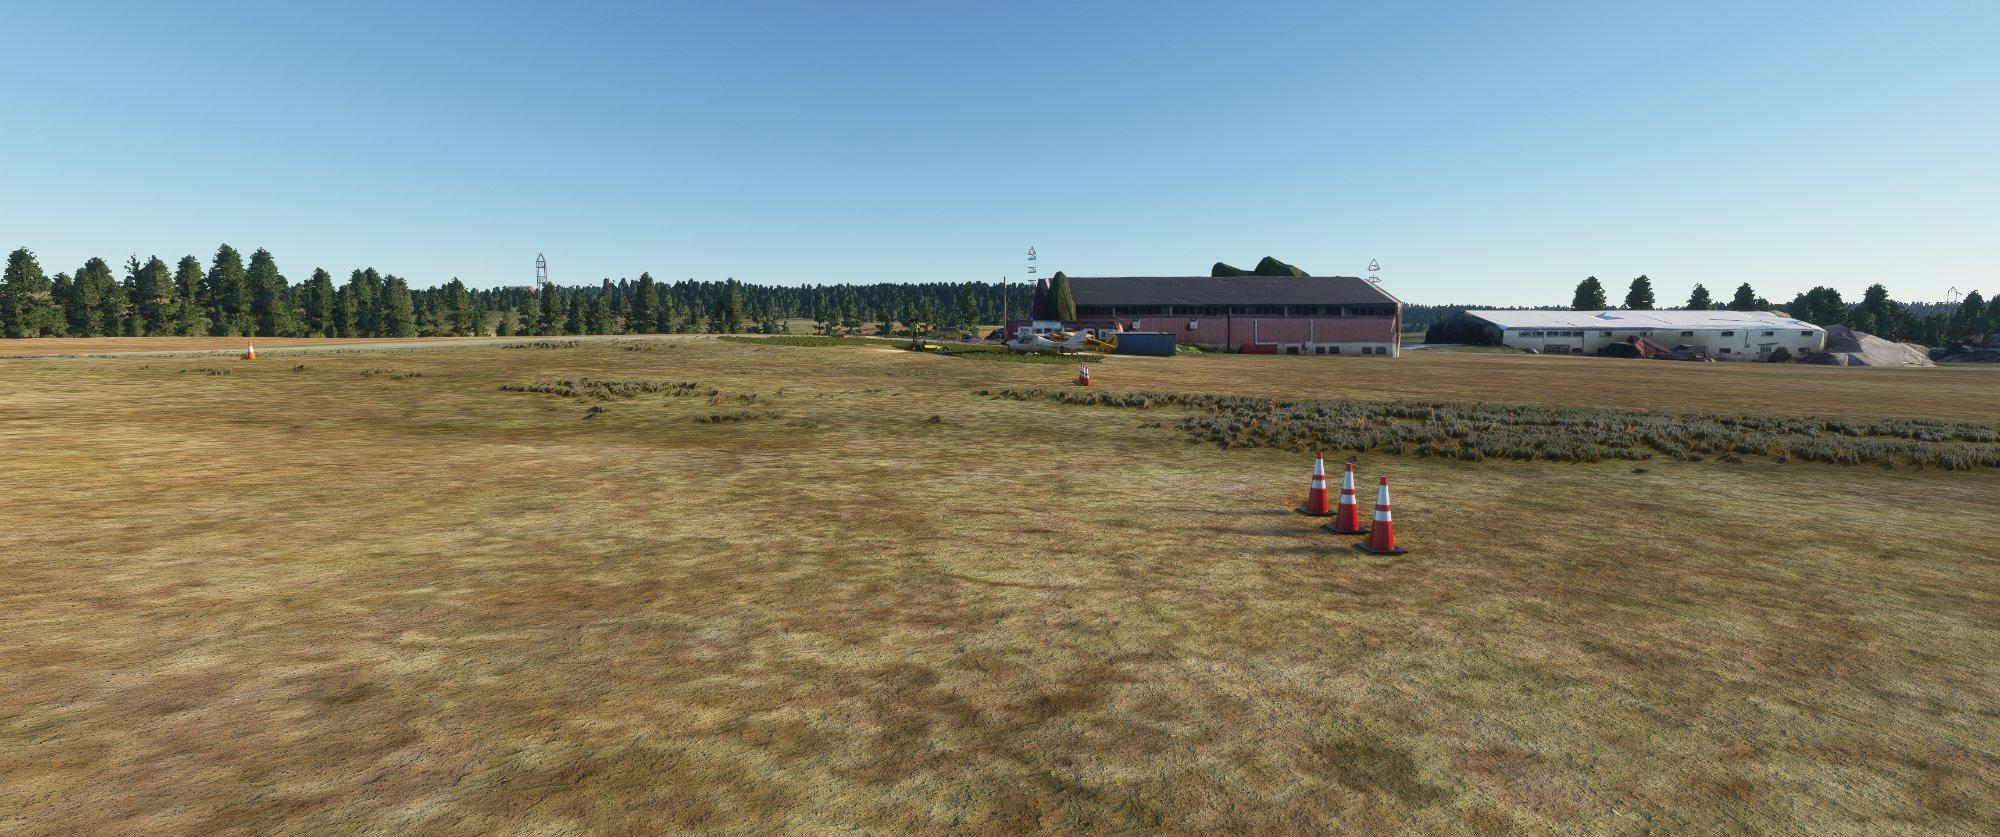 Microsoft Flight Simulator Screenshot 2020.11.06 - 12.17.23.44.jpg